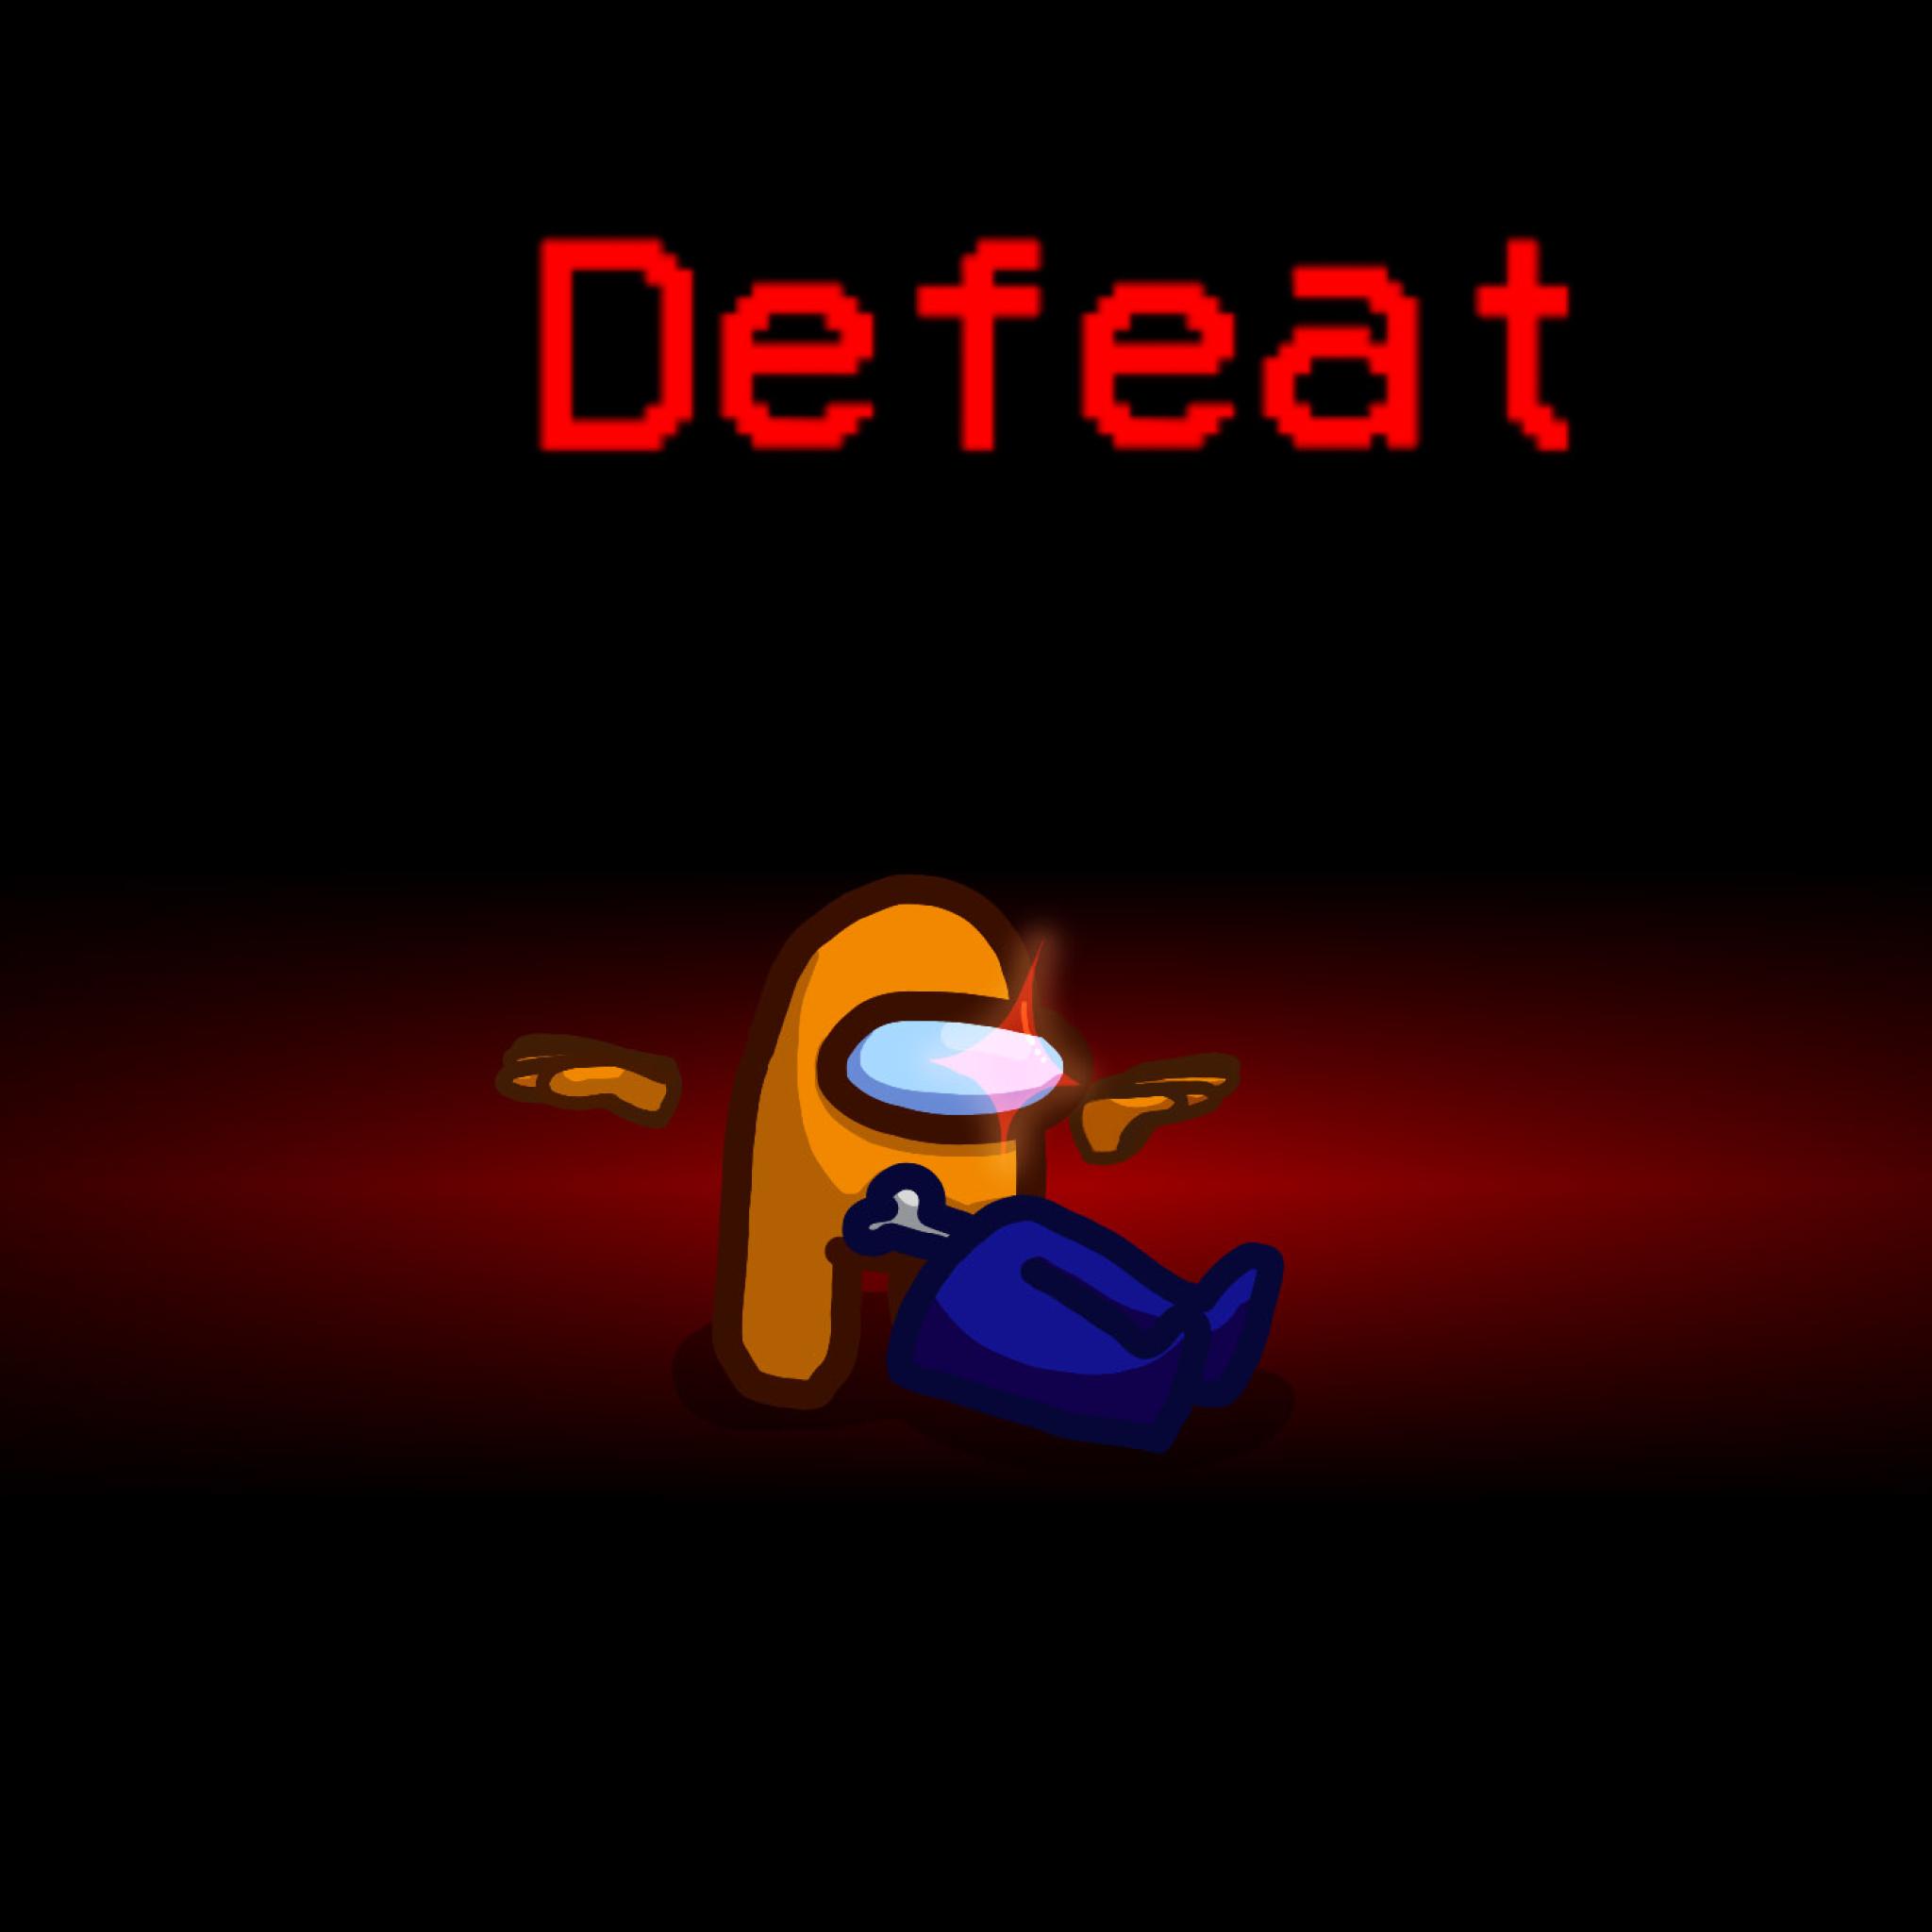 2048x2048 Yellow Defeat Crewmate Among Us Ipad Air ...